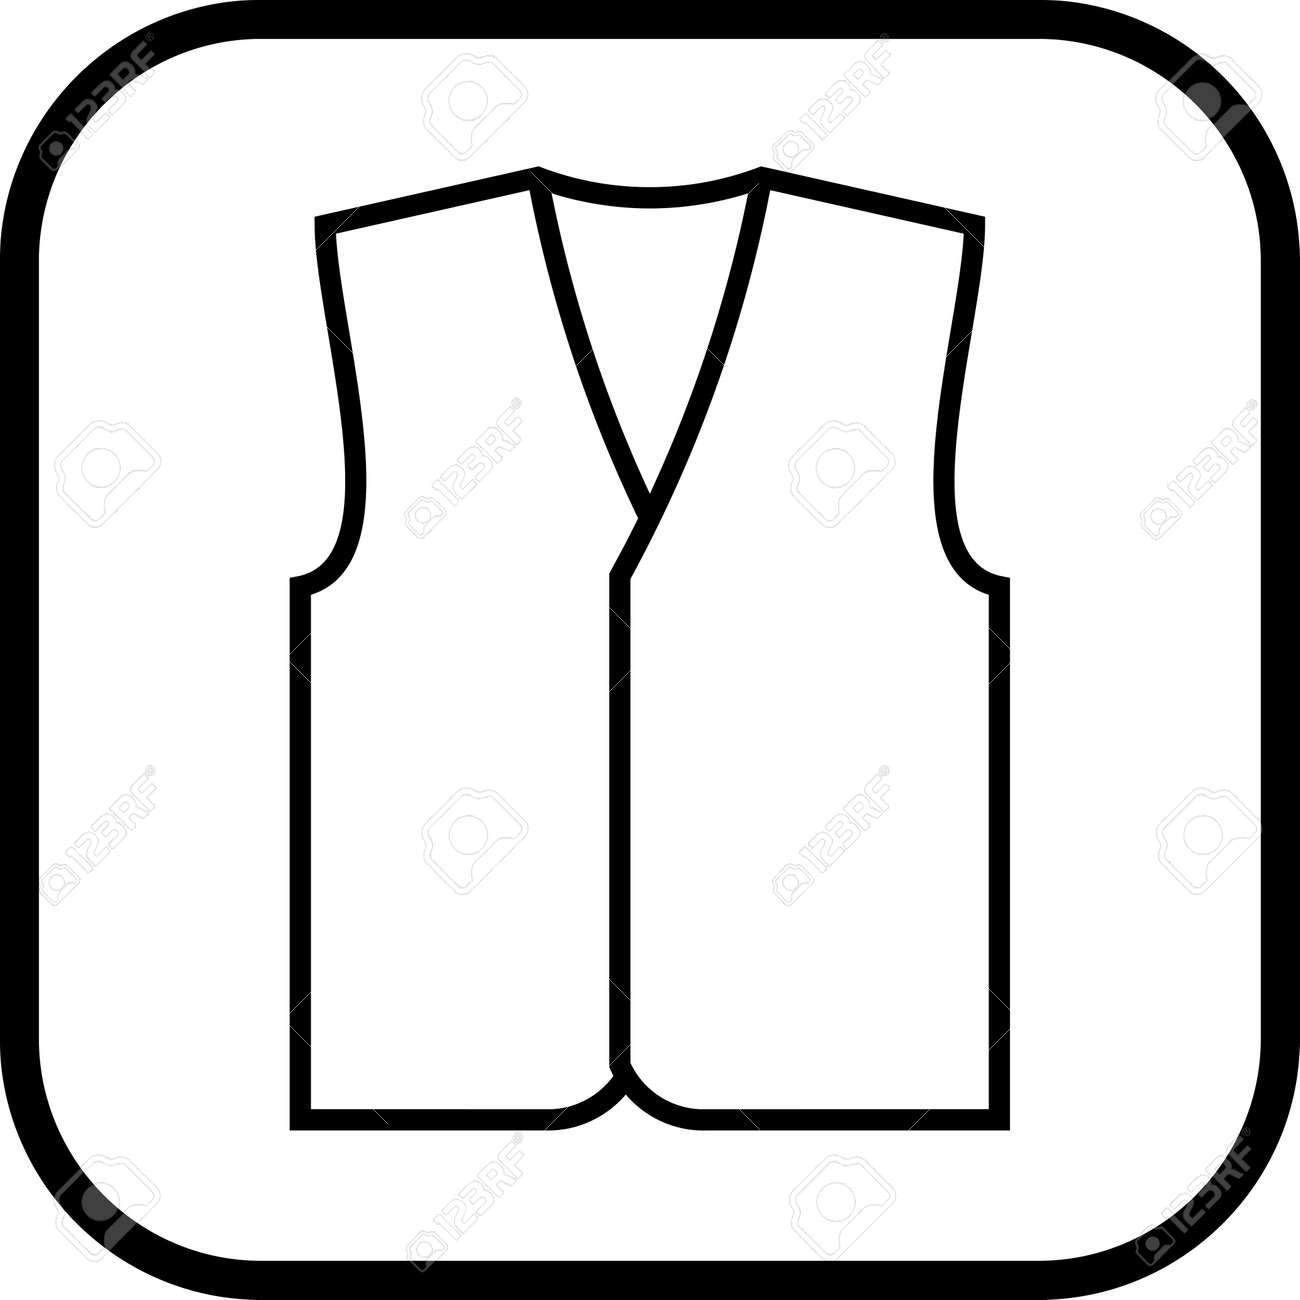 Vest vector icon - 52956170